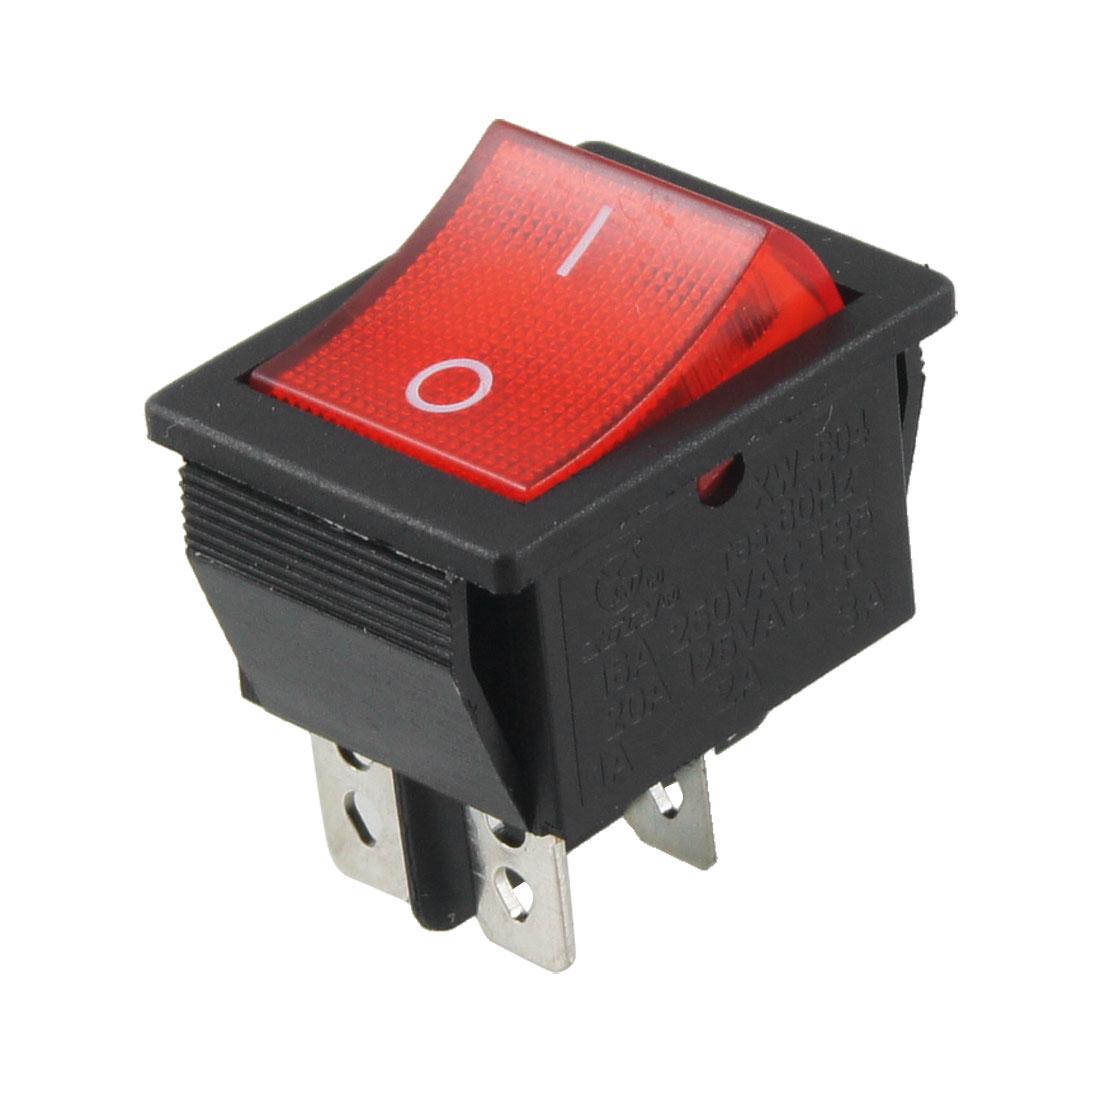 Red Black 4 Pin DPST on/off AC 250V/16A 125V/20A Rocker Switch